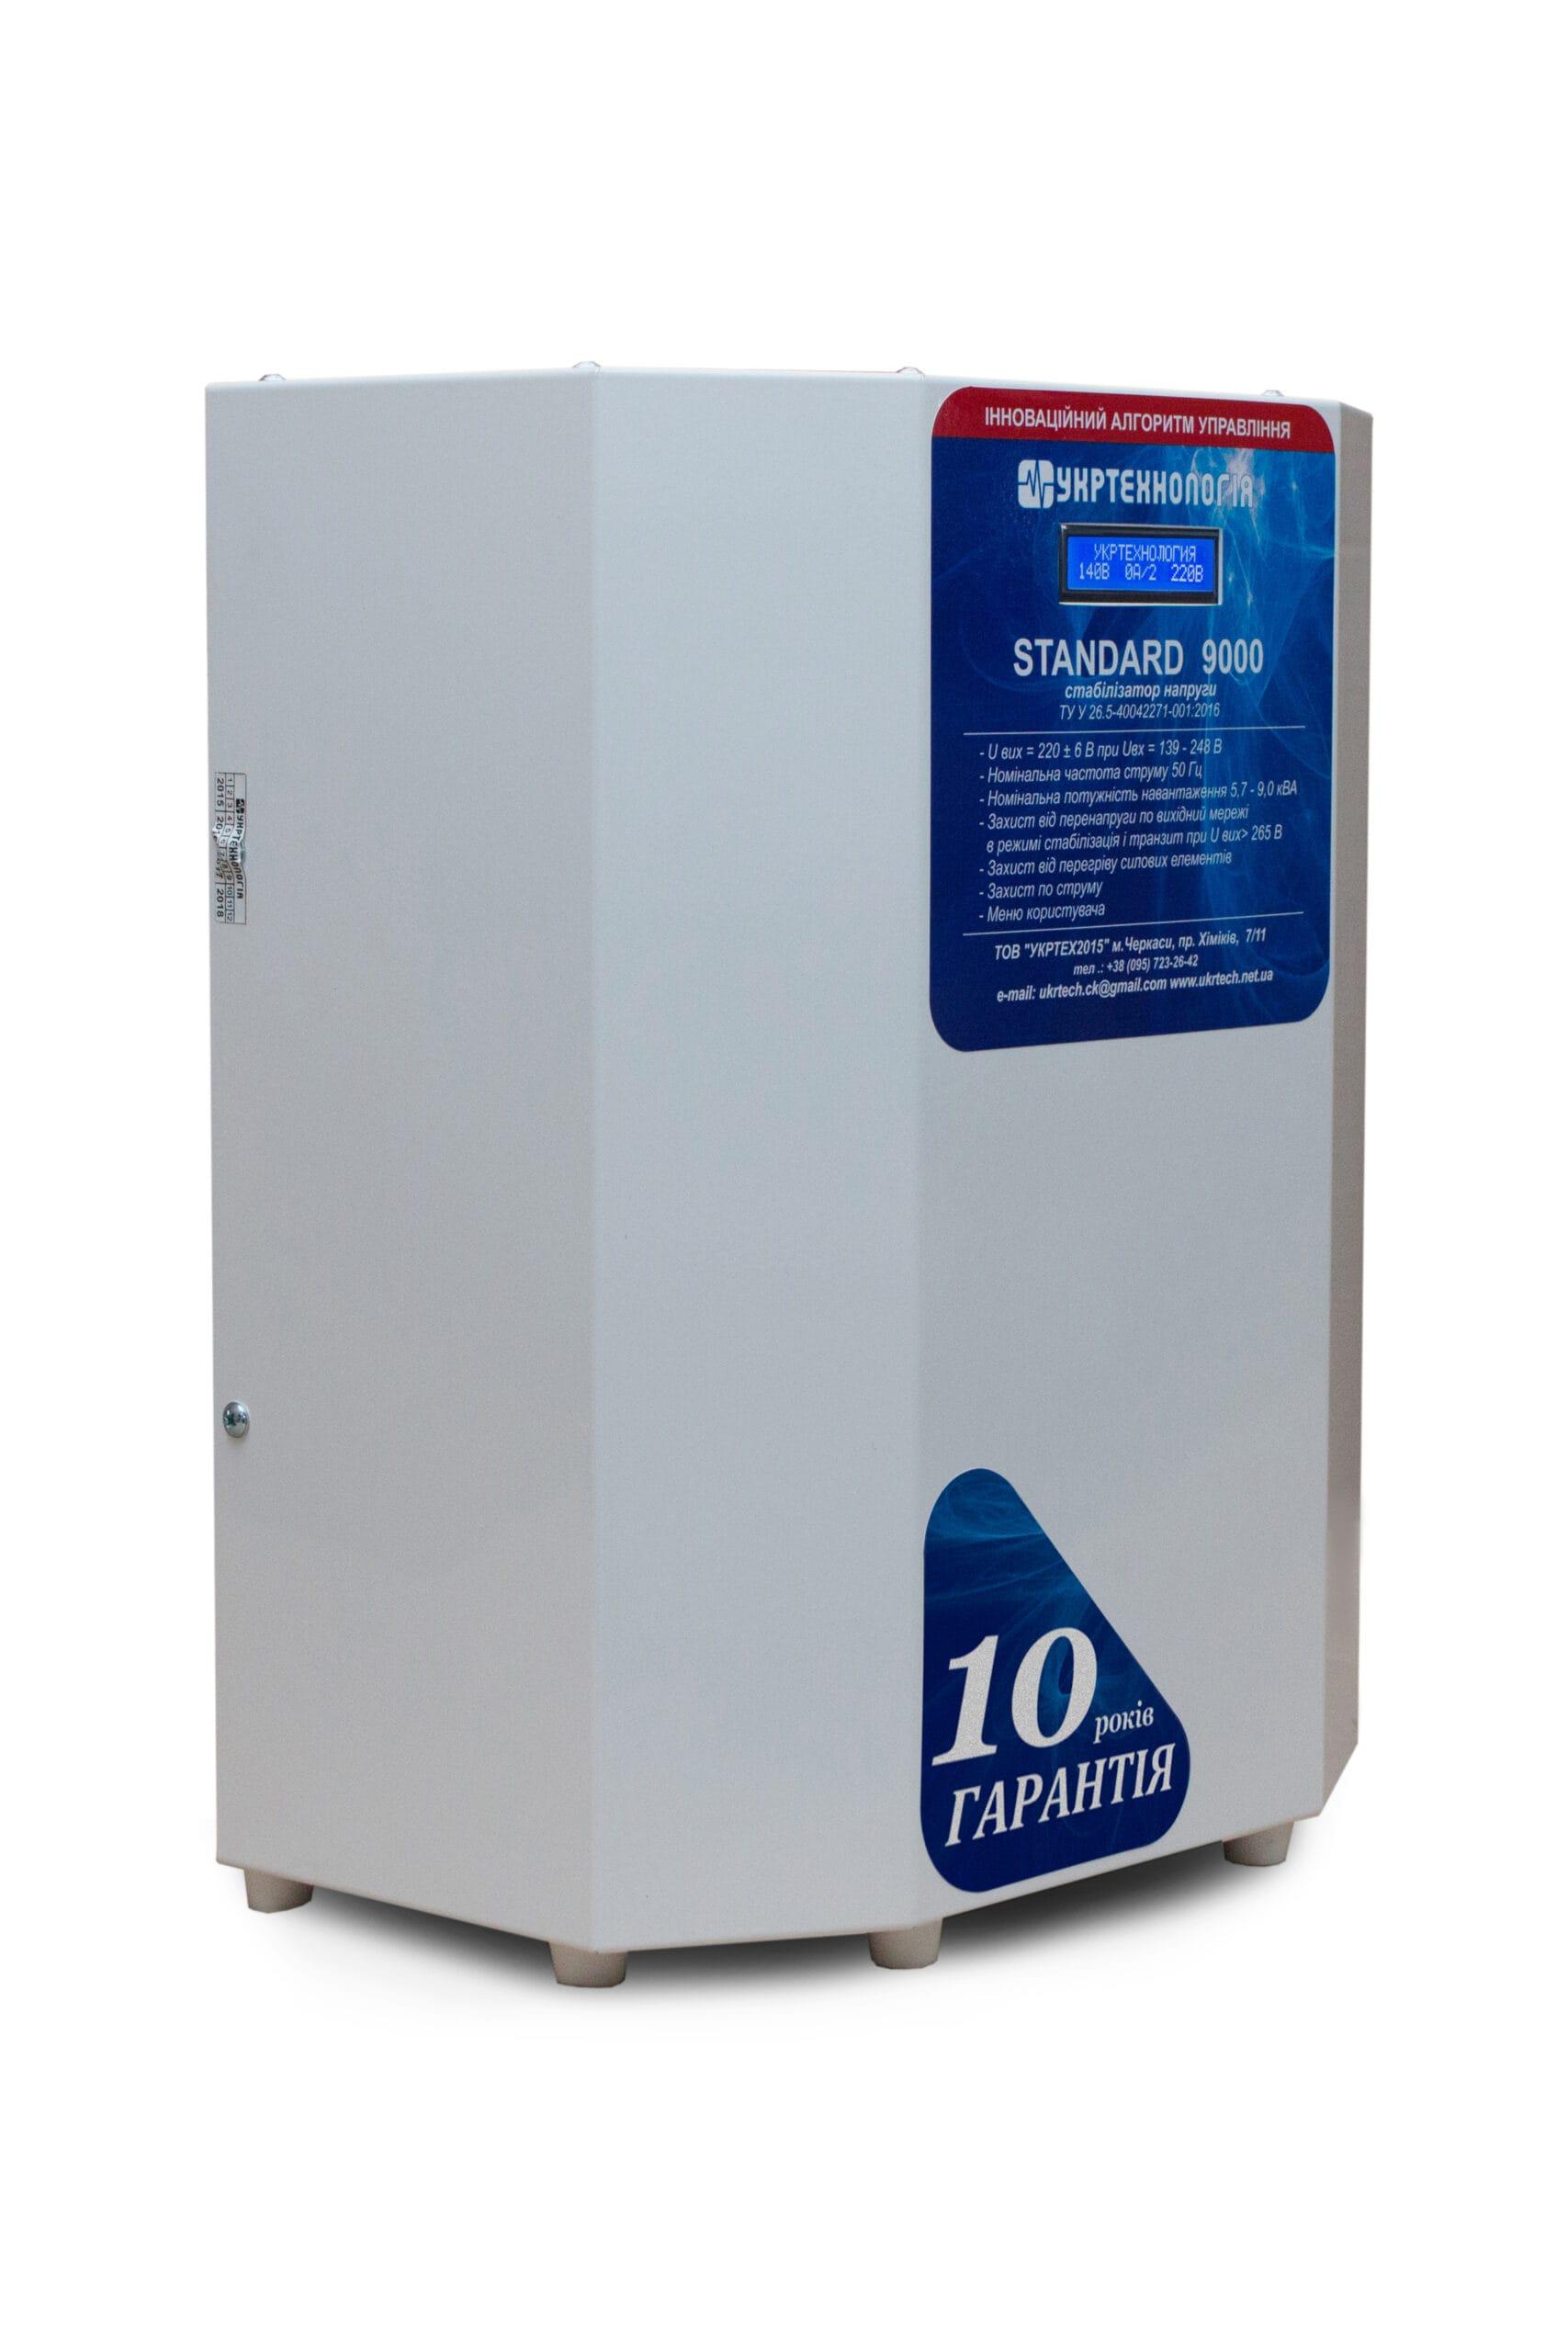 Стабилизаторы напряжения - Стабилизатор напряжения 9 кВт STANDARD 000001398 - Фото 3